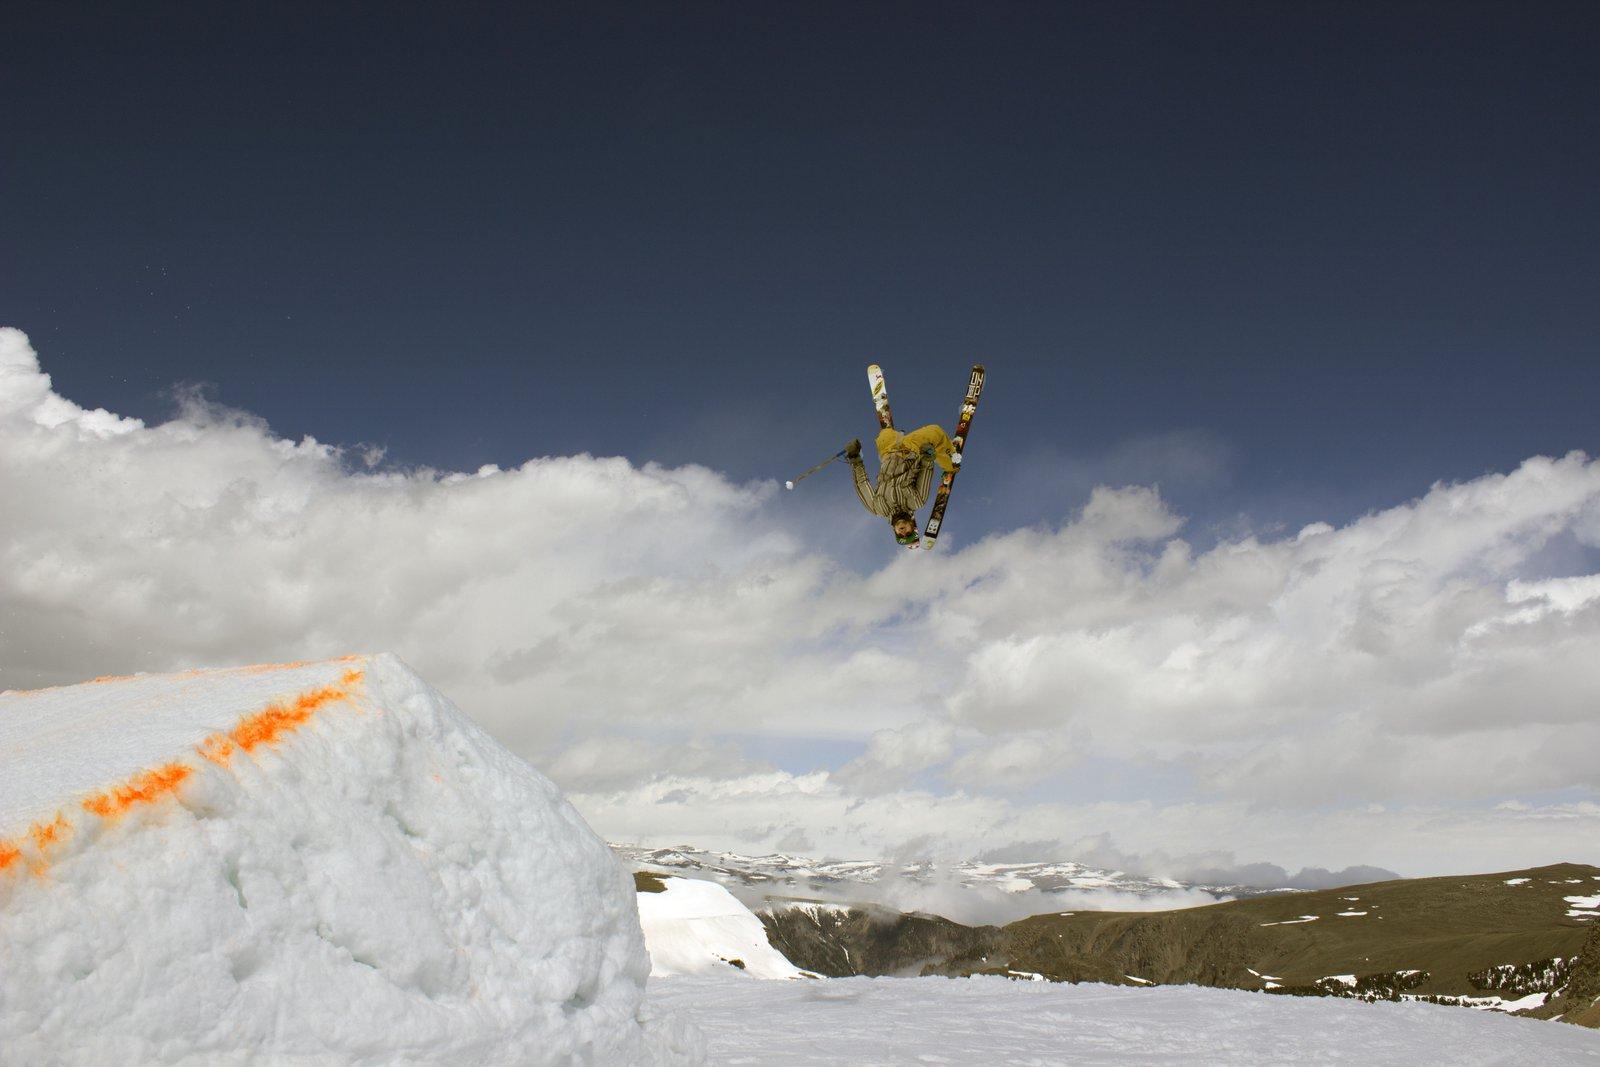 Sander Hadley Flippin' Out